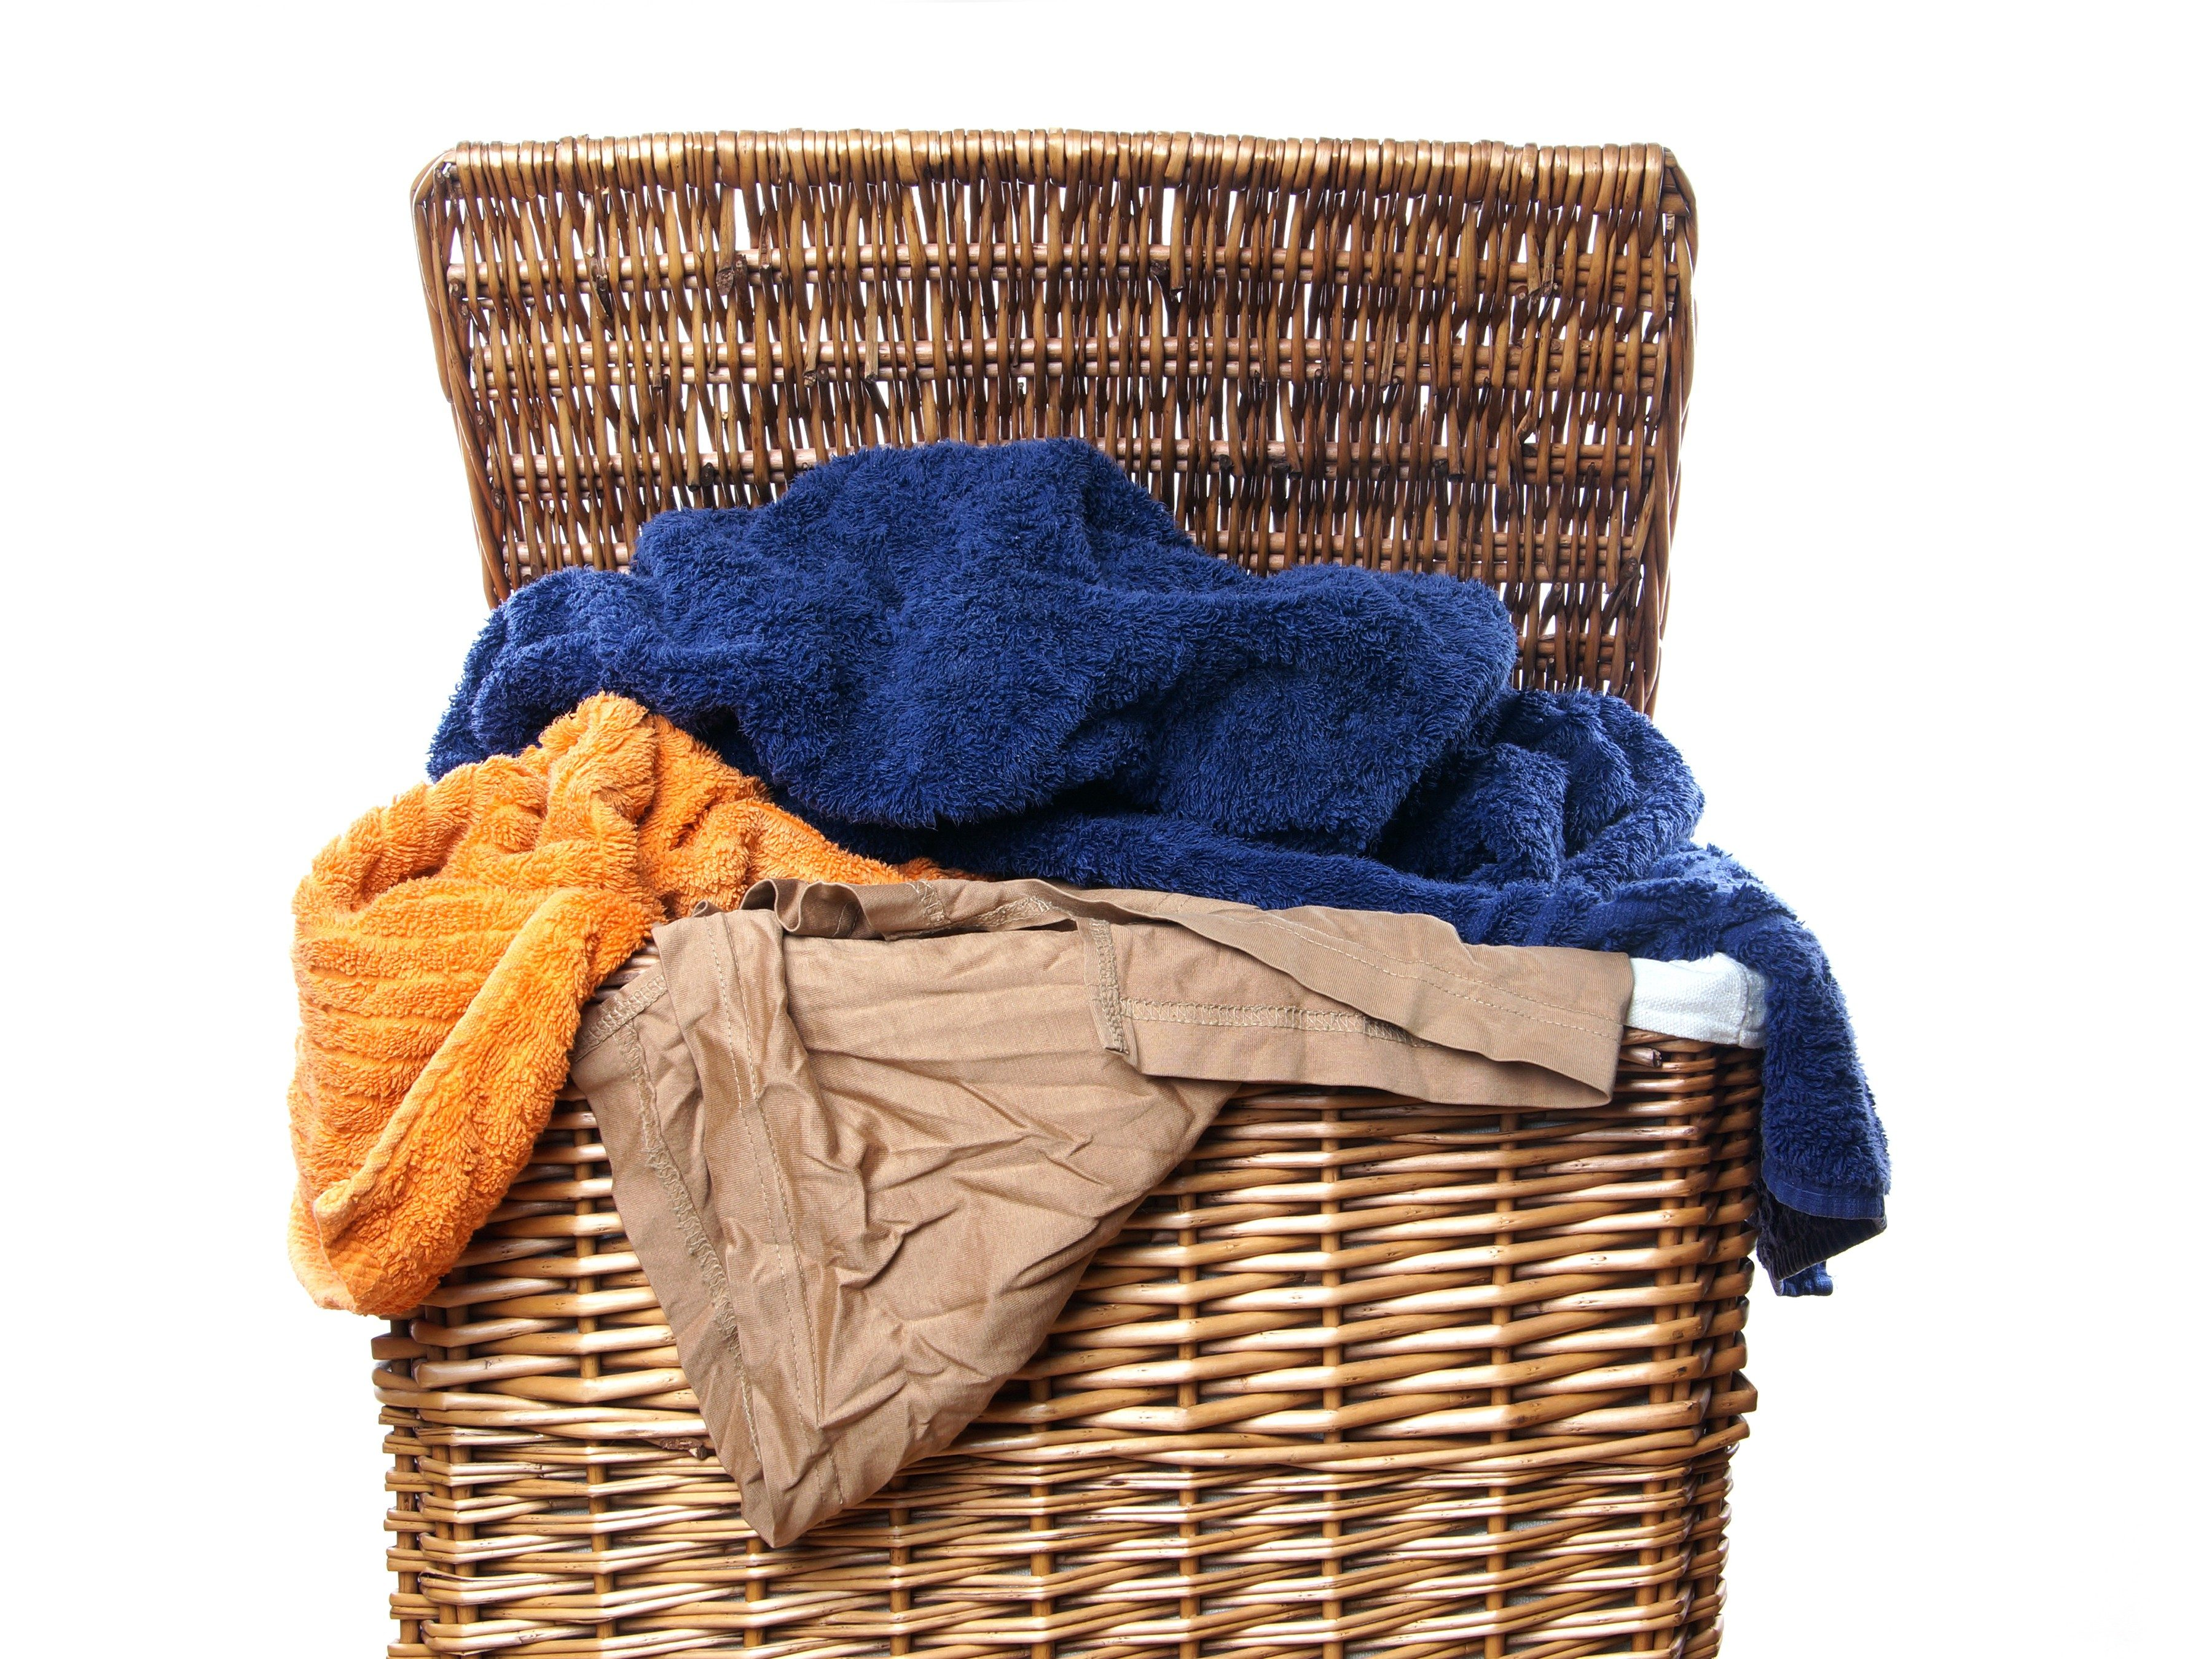 6. Freshen a Laundry Hamper